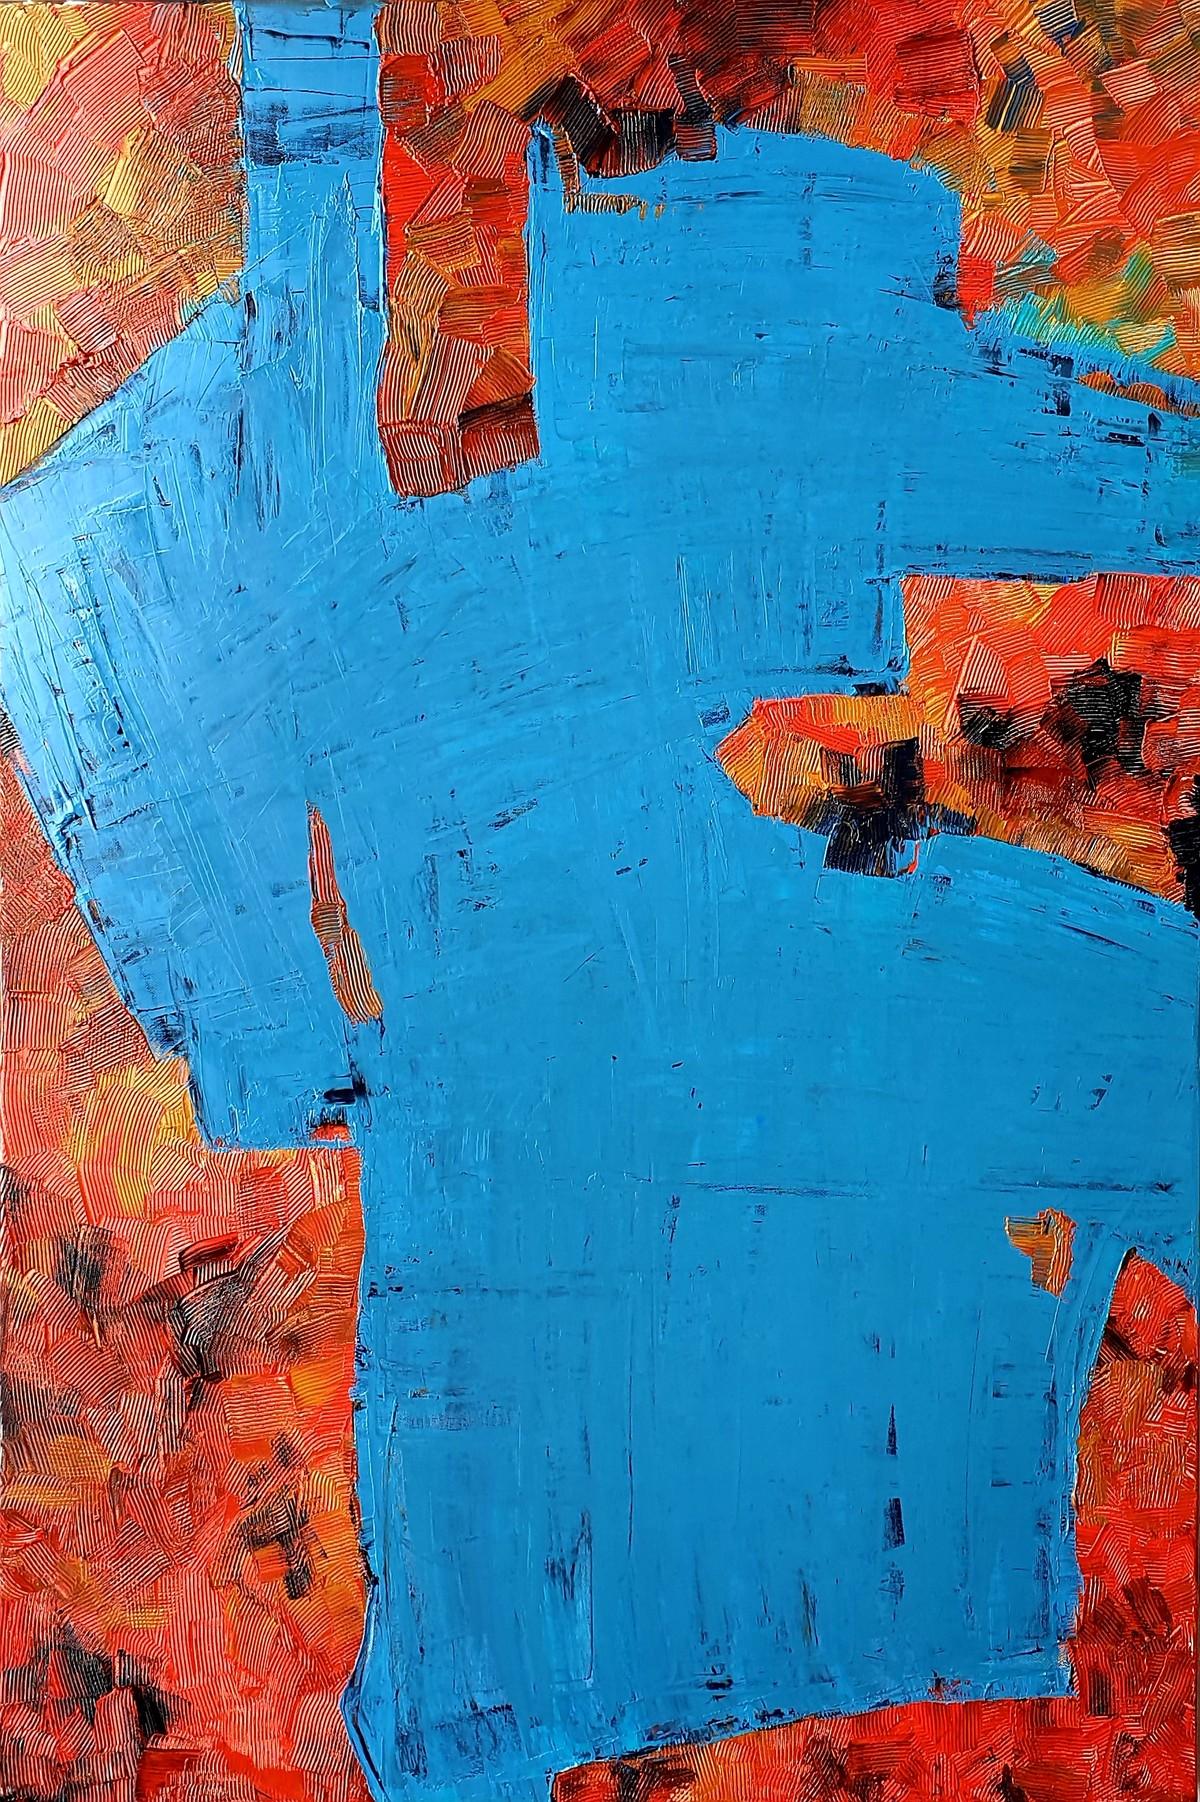 Familiar Boundaries by RUCHIKA KAWLRA MOTWANI, Abstract Painting, Oil on Linen, Blue color